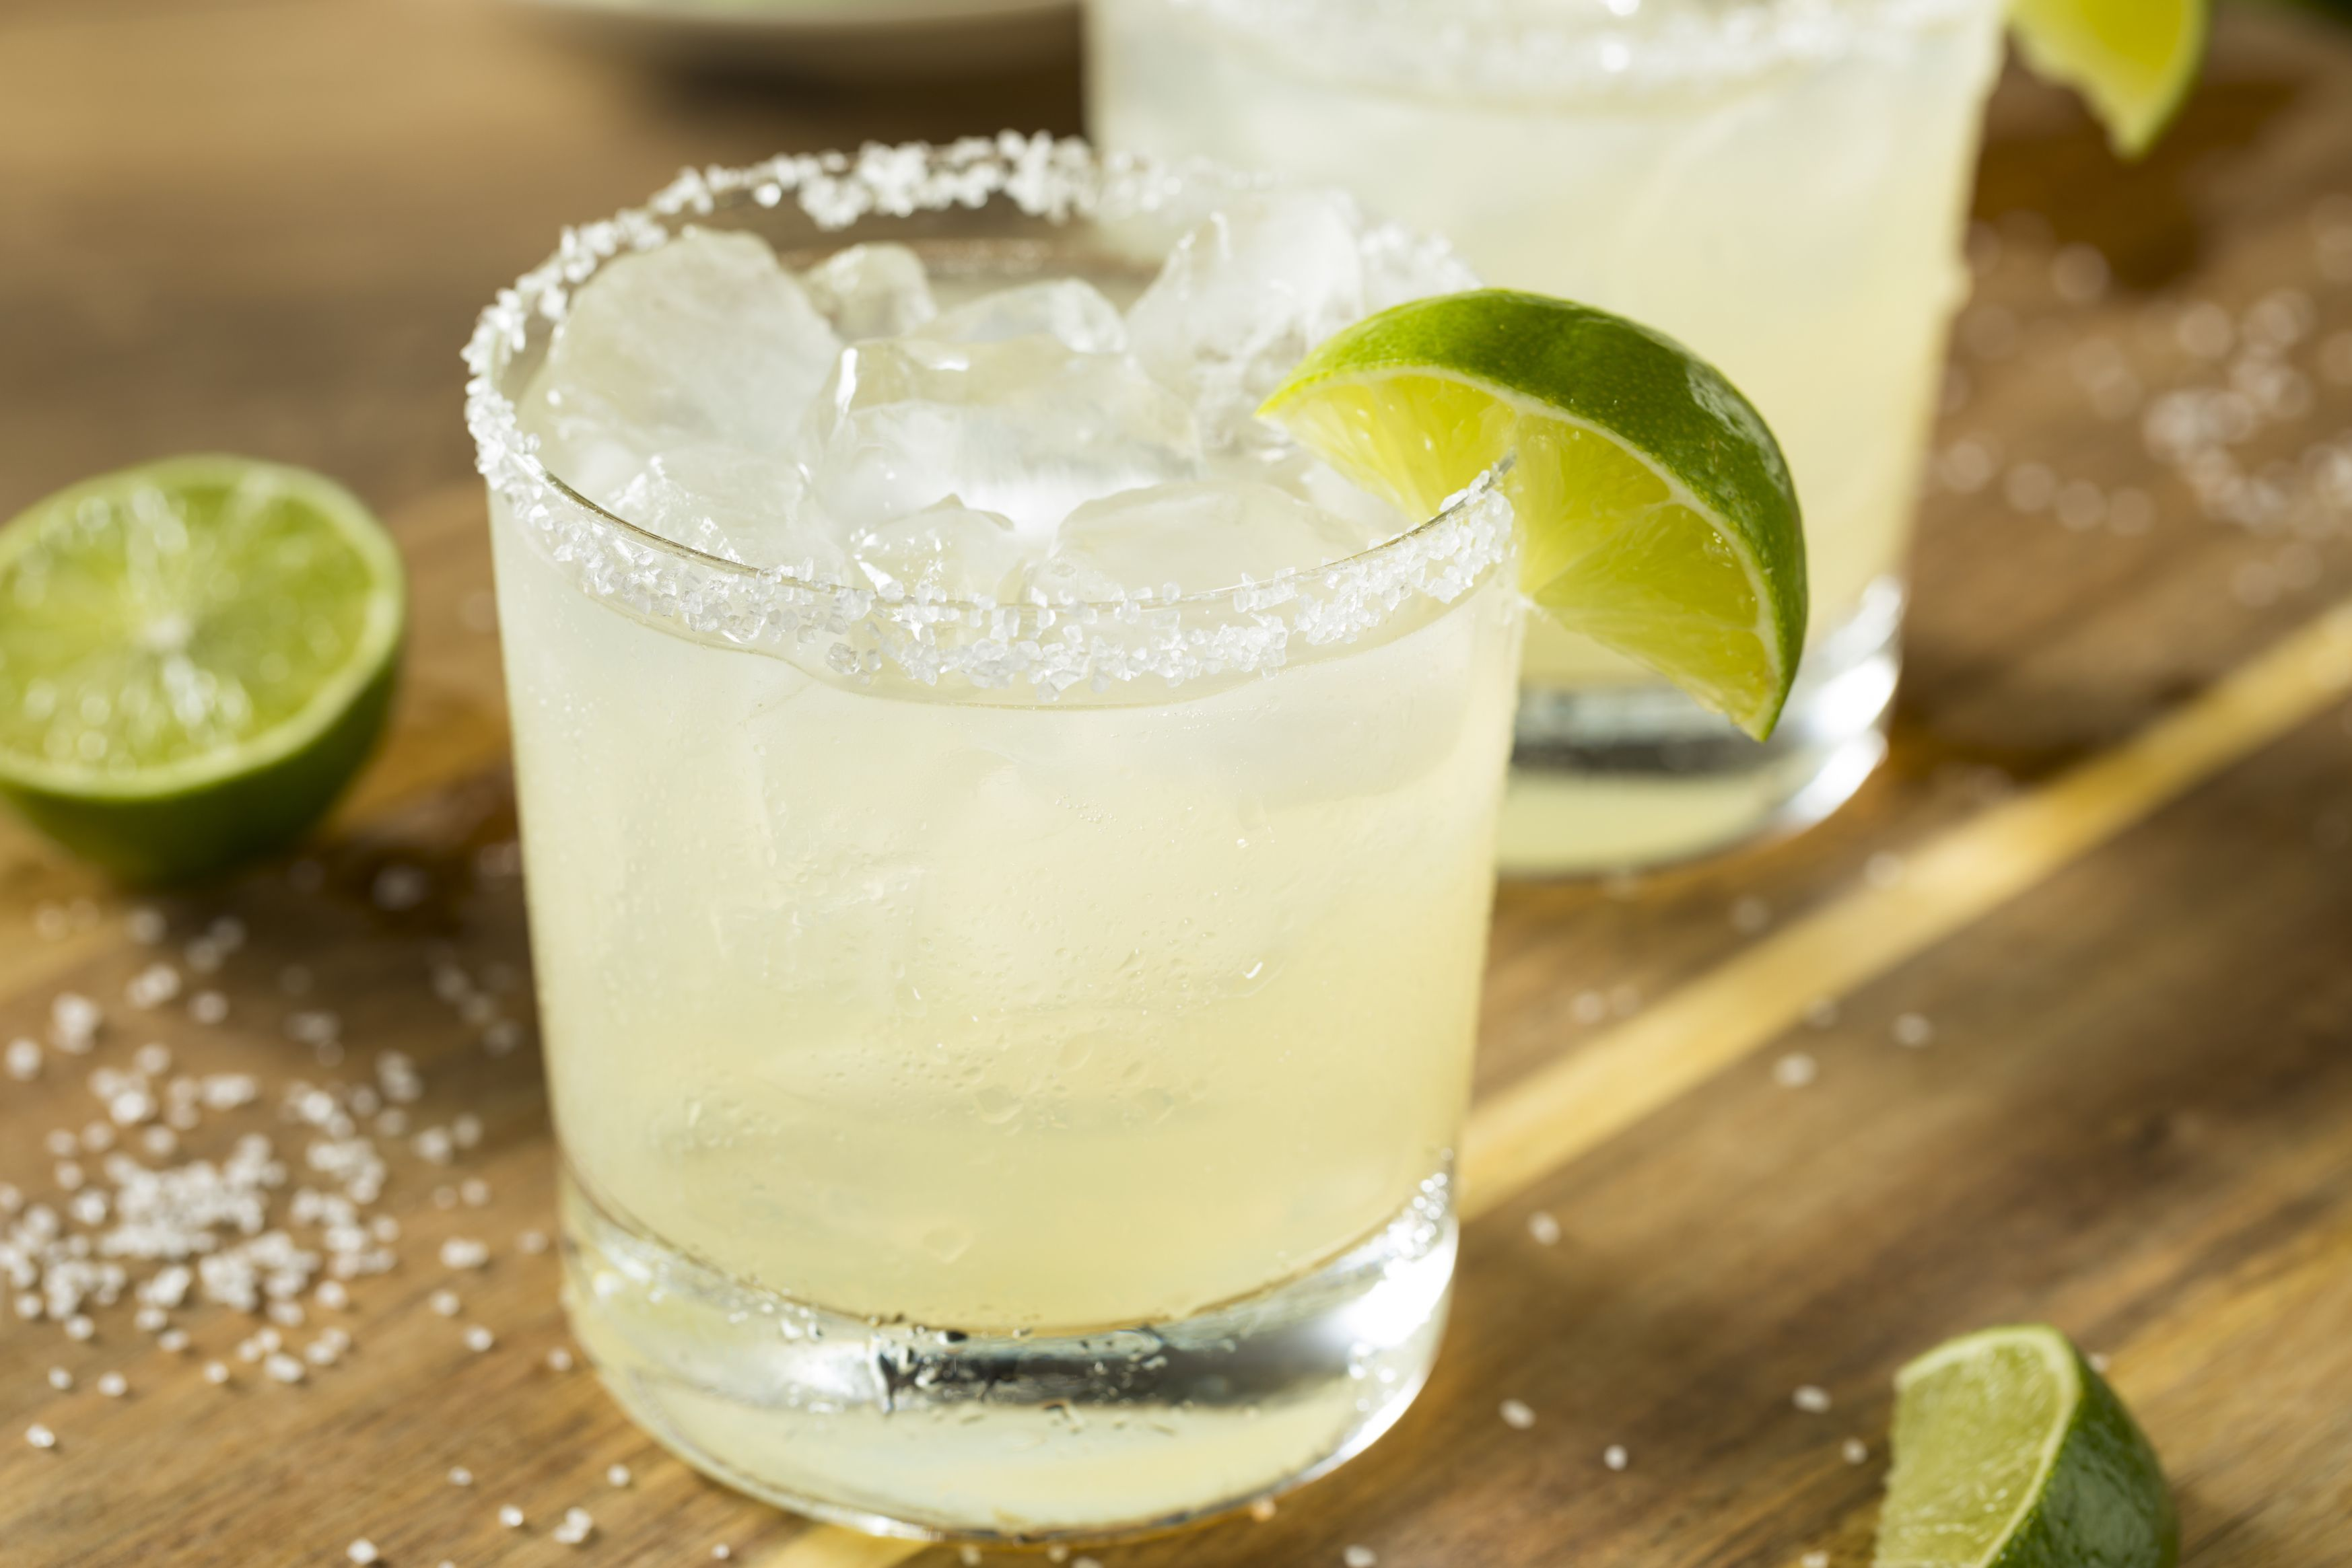 How to make a good margarita mix